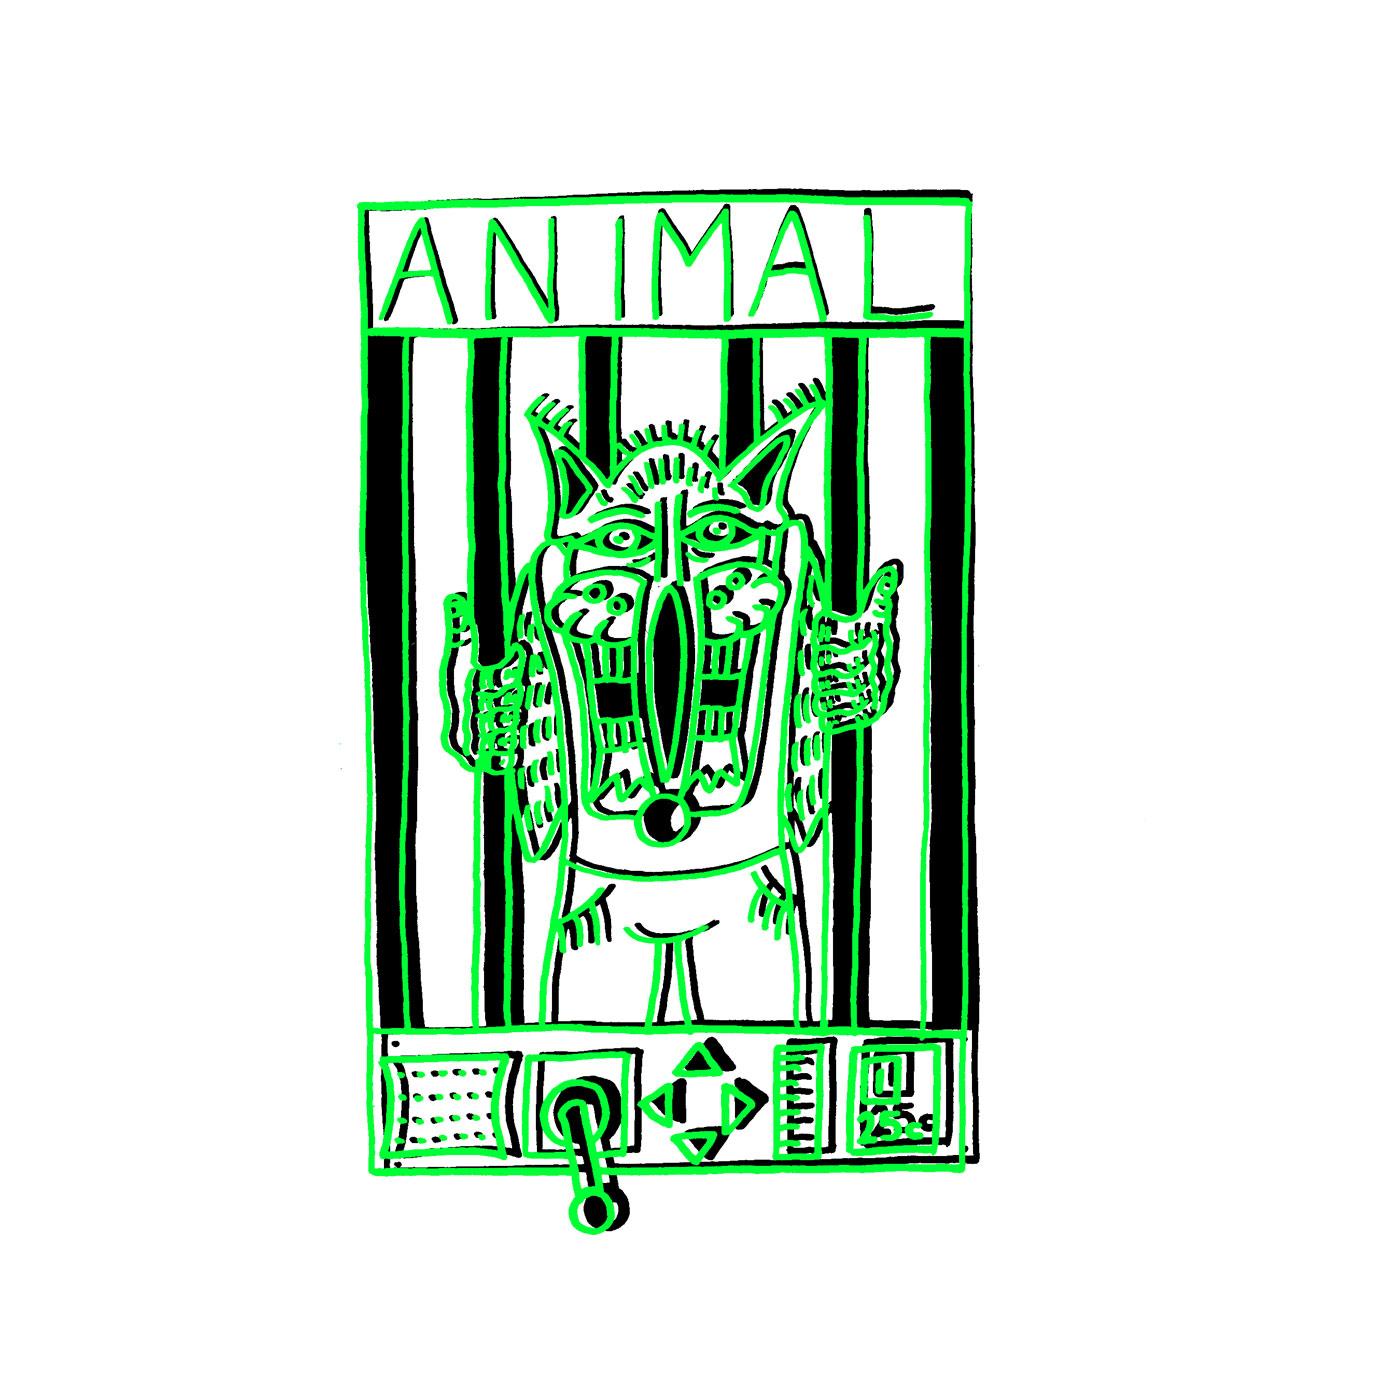 GR032_ANIMAL_SINGLE3_1400.jpg